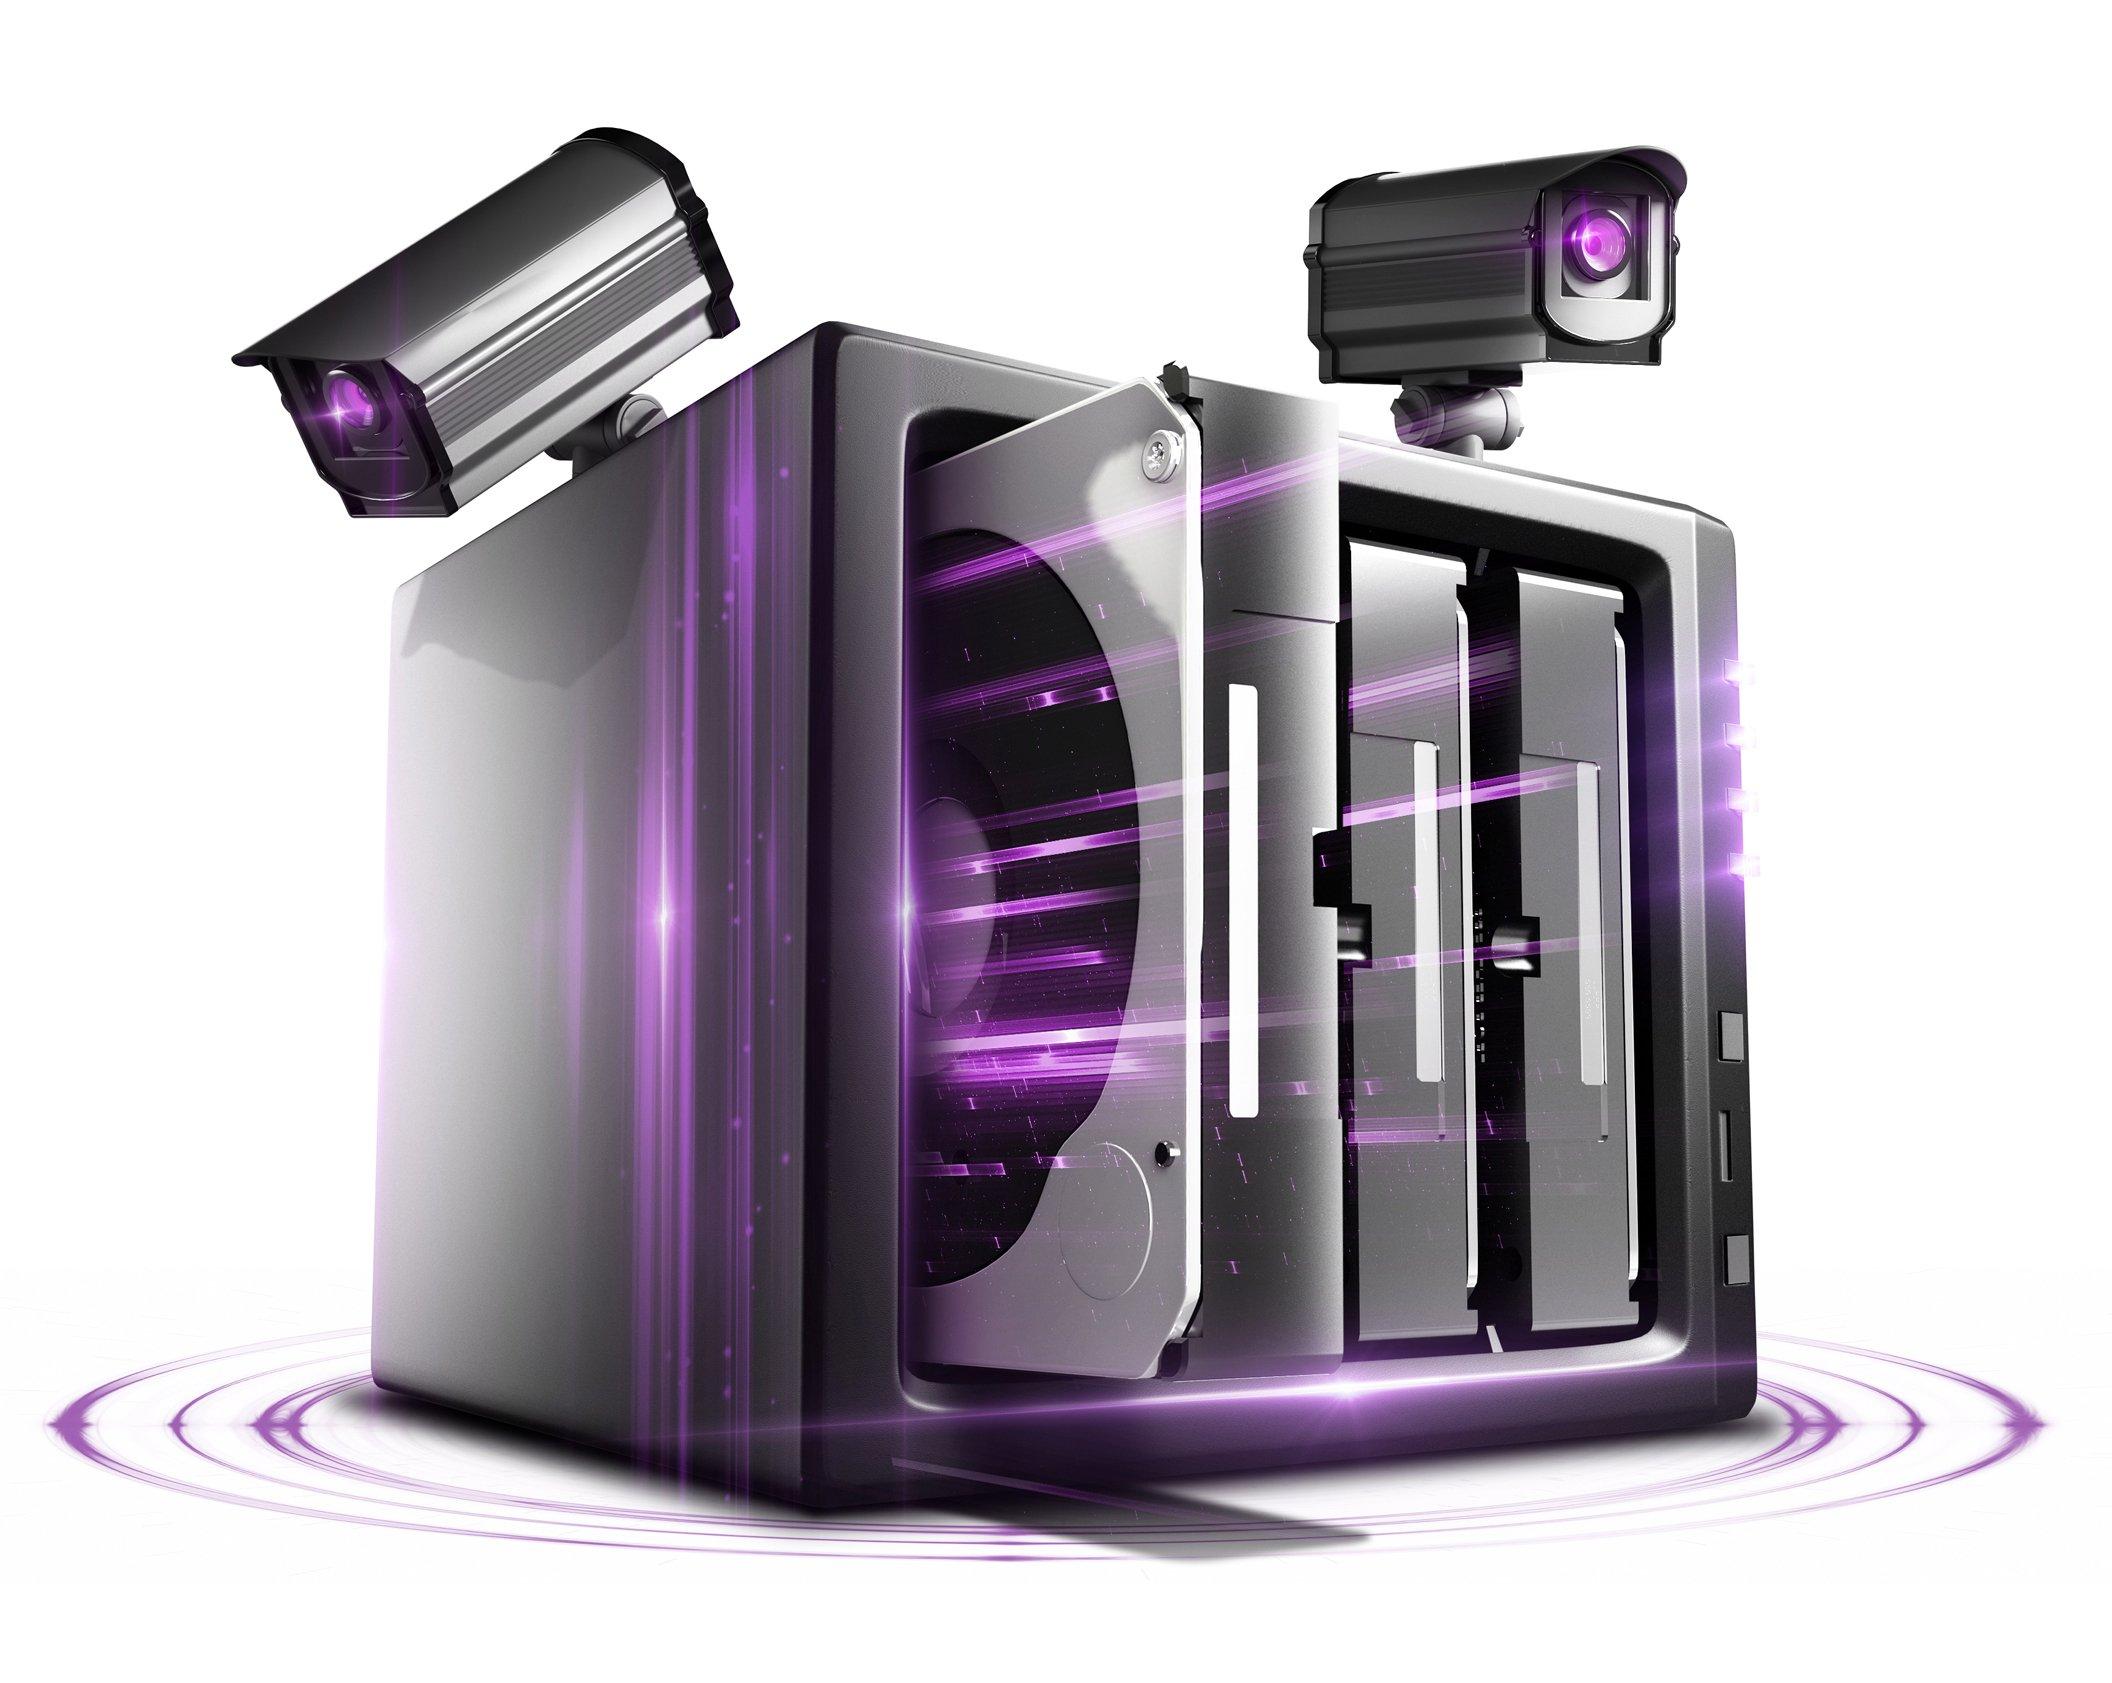 WD Purple 10TB Surveillance Hard Disk Drive - 5400 RPM Class SATA 6 Gb/s 256MB Cache 3.5 - WD100PURZ by Western Digital (Image #2)